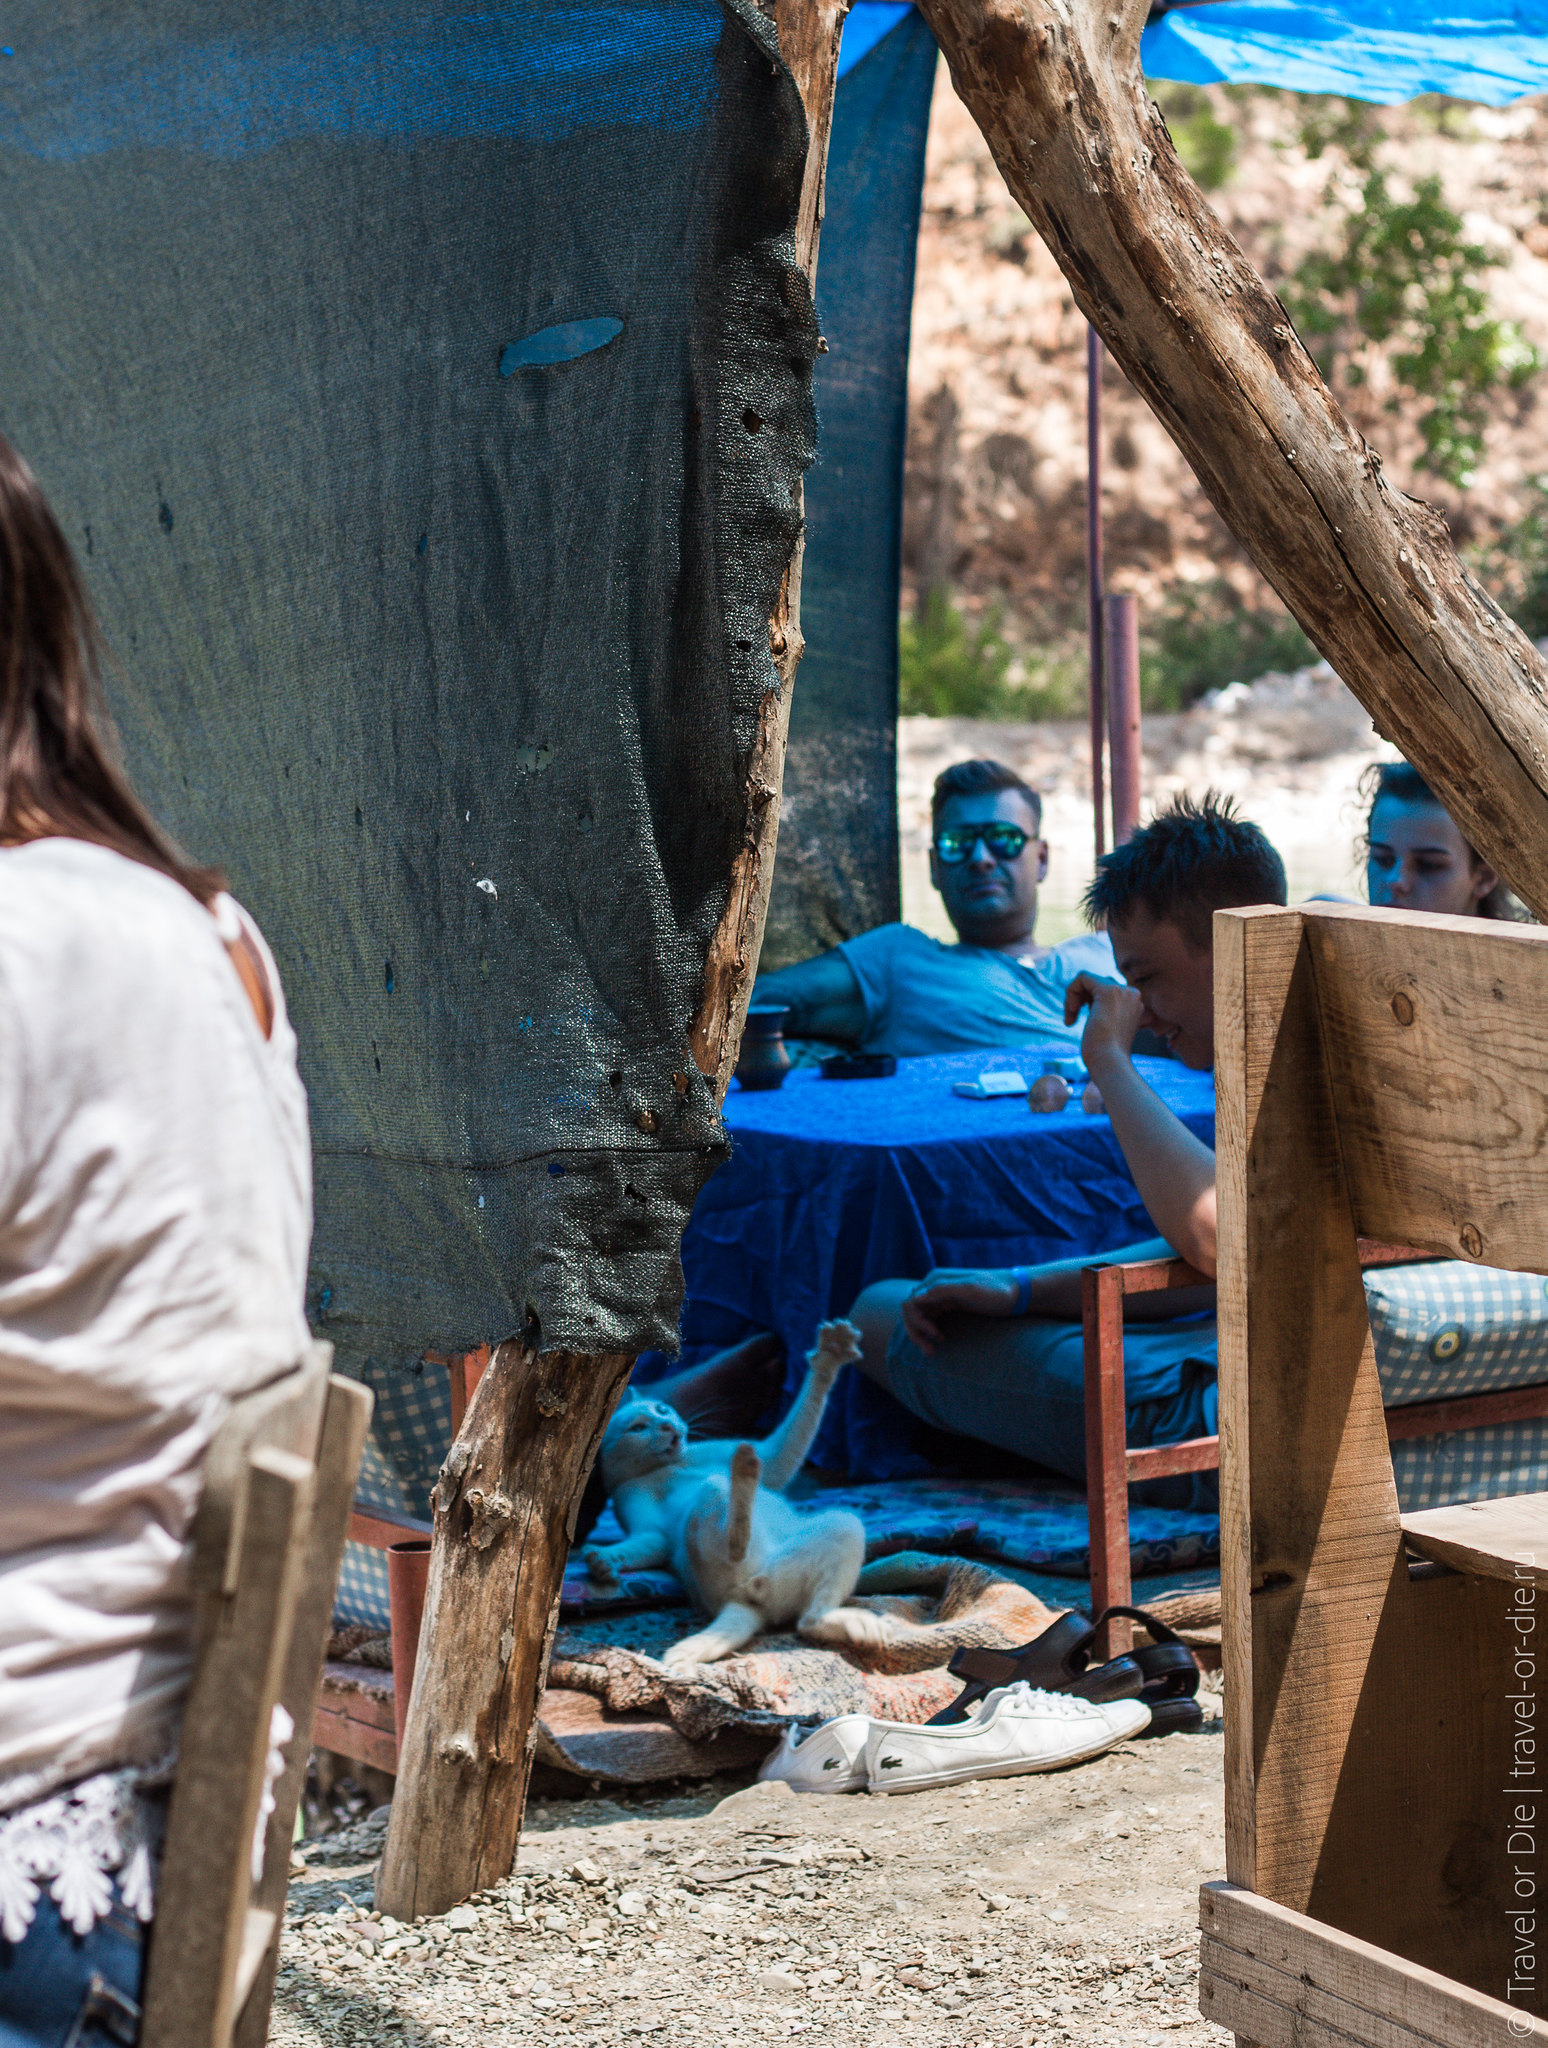 Sapadere-Canyon-Tour-экскурсия-в-каньон-сападере-6151